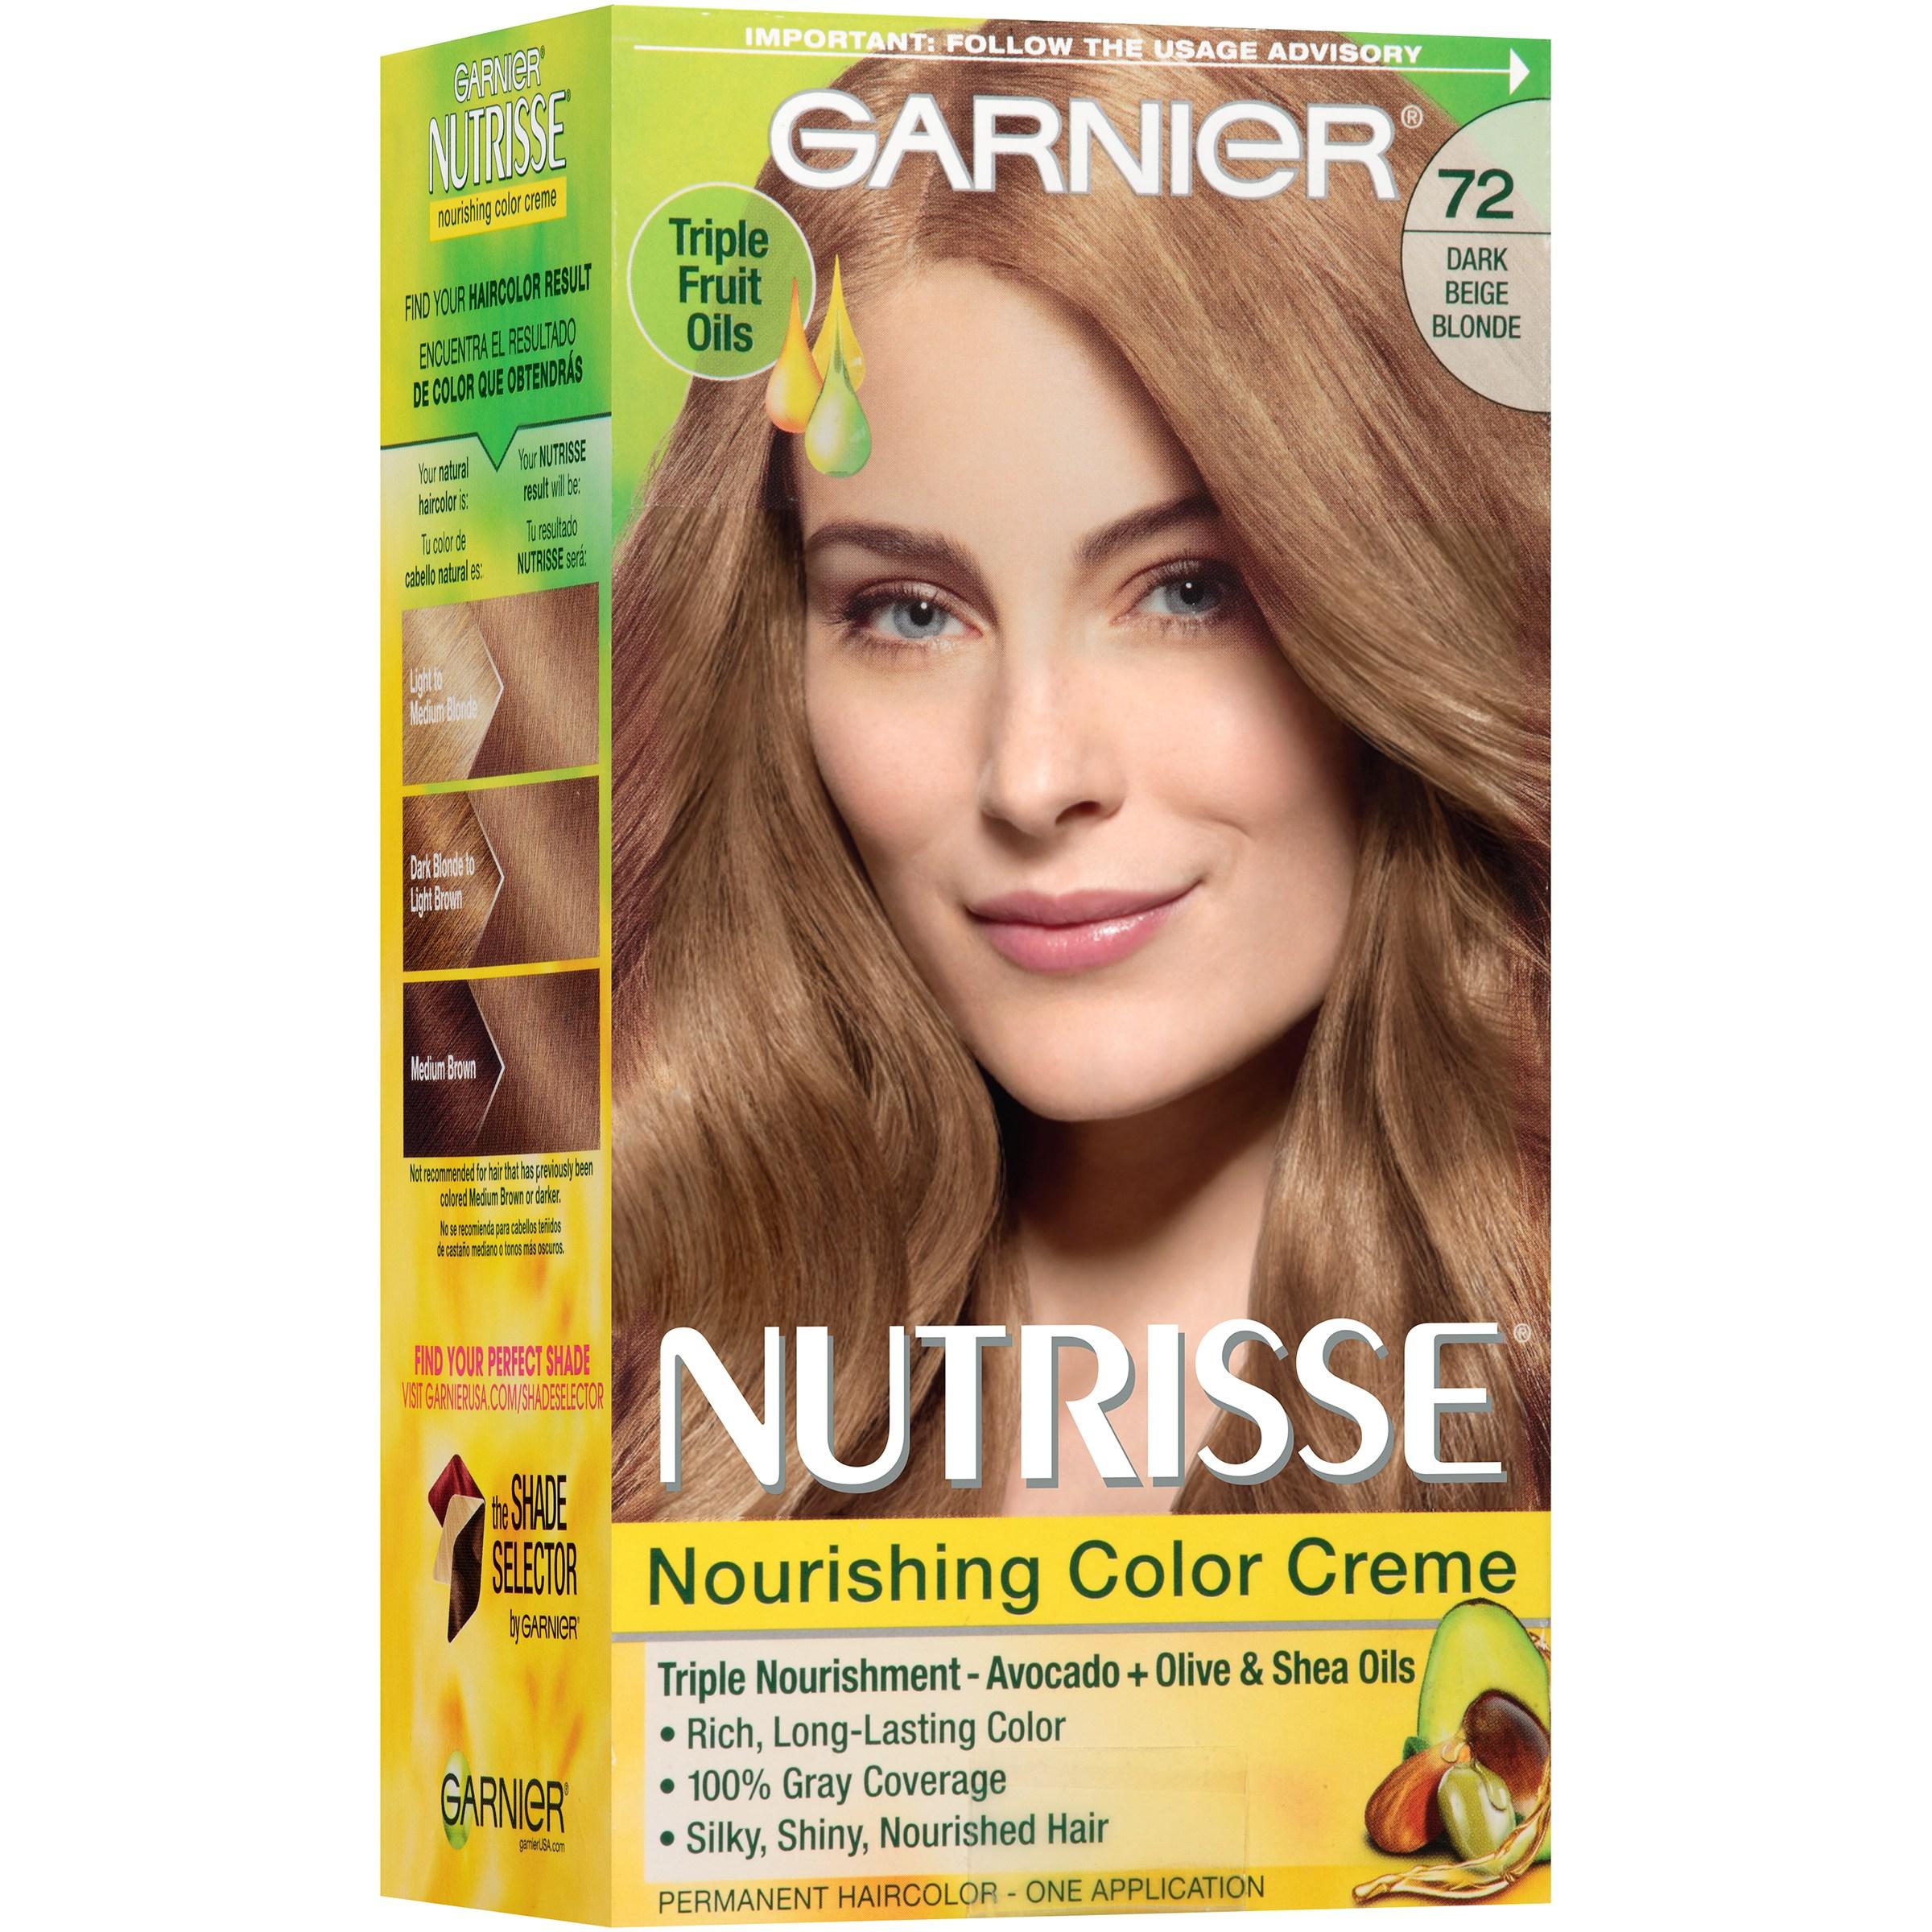 Garnier Nutrisse Nourishing Color Creme Hair Color, 72 Dark Beige Blonde Sweet Latte  Walmart.com